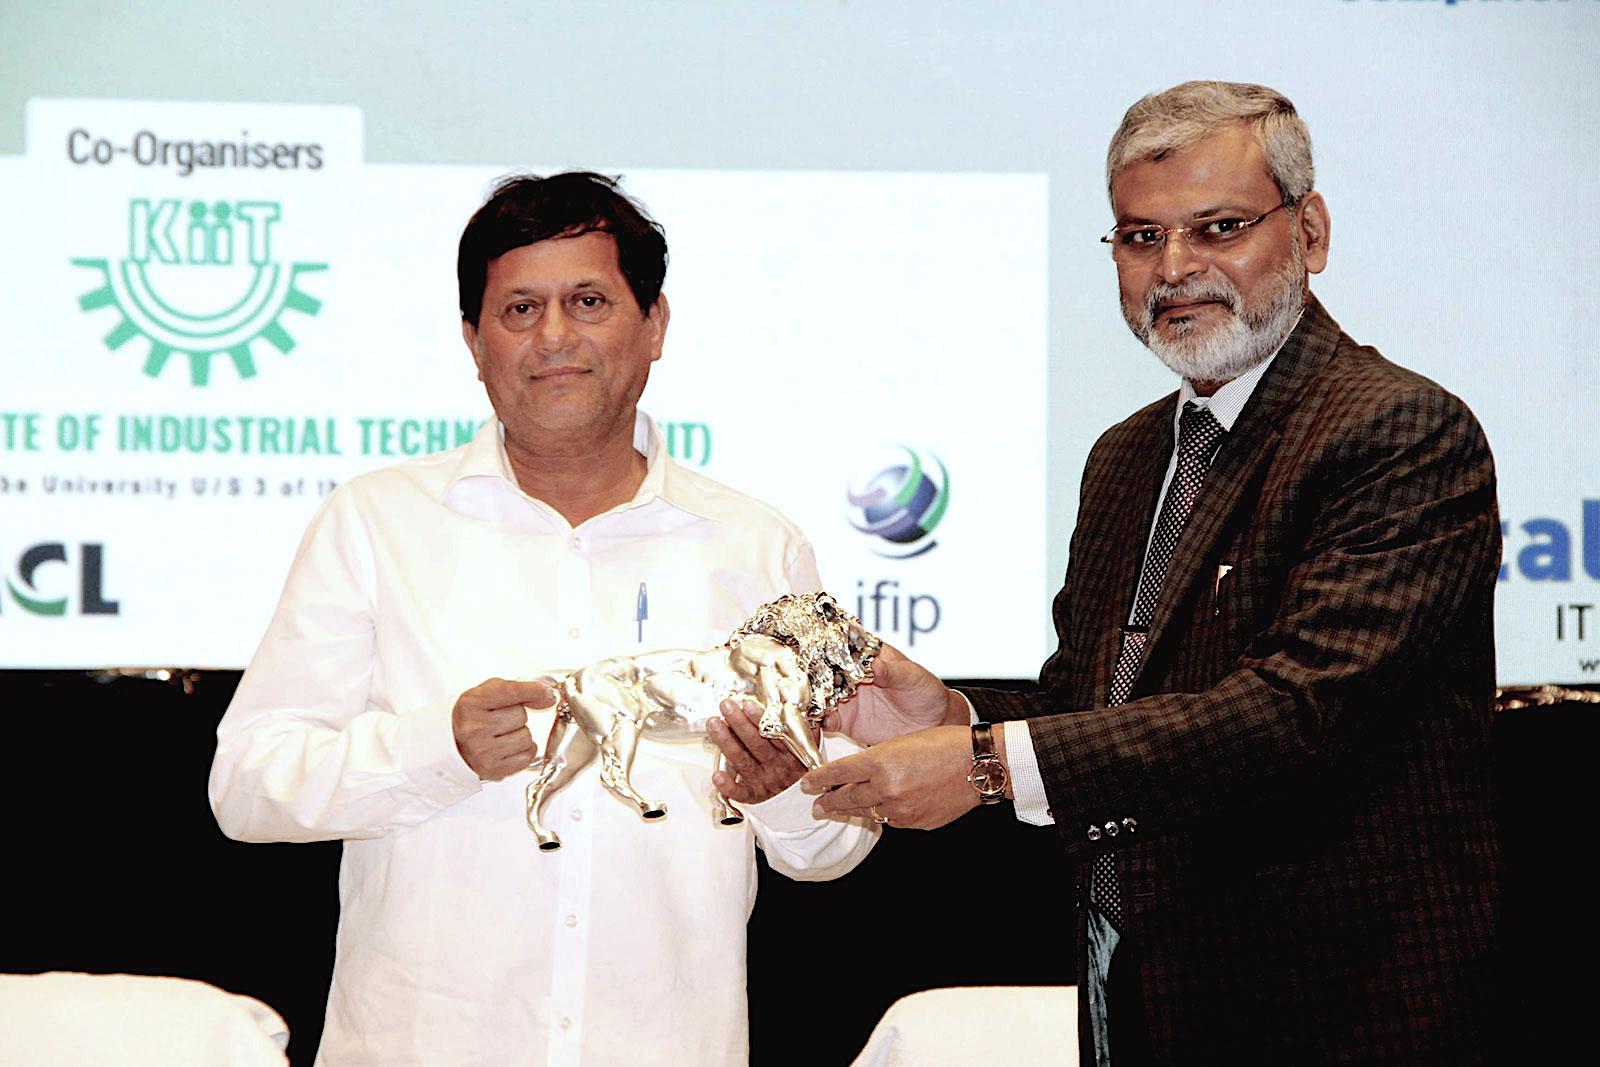 CSI life time award conferred on Achyuta Samanta